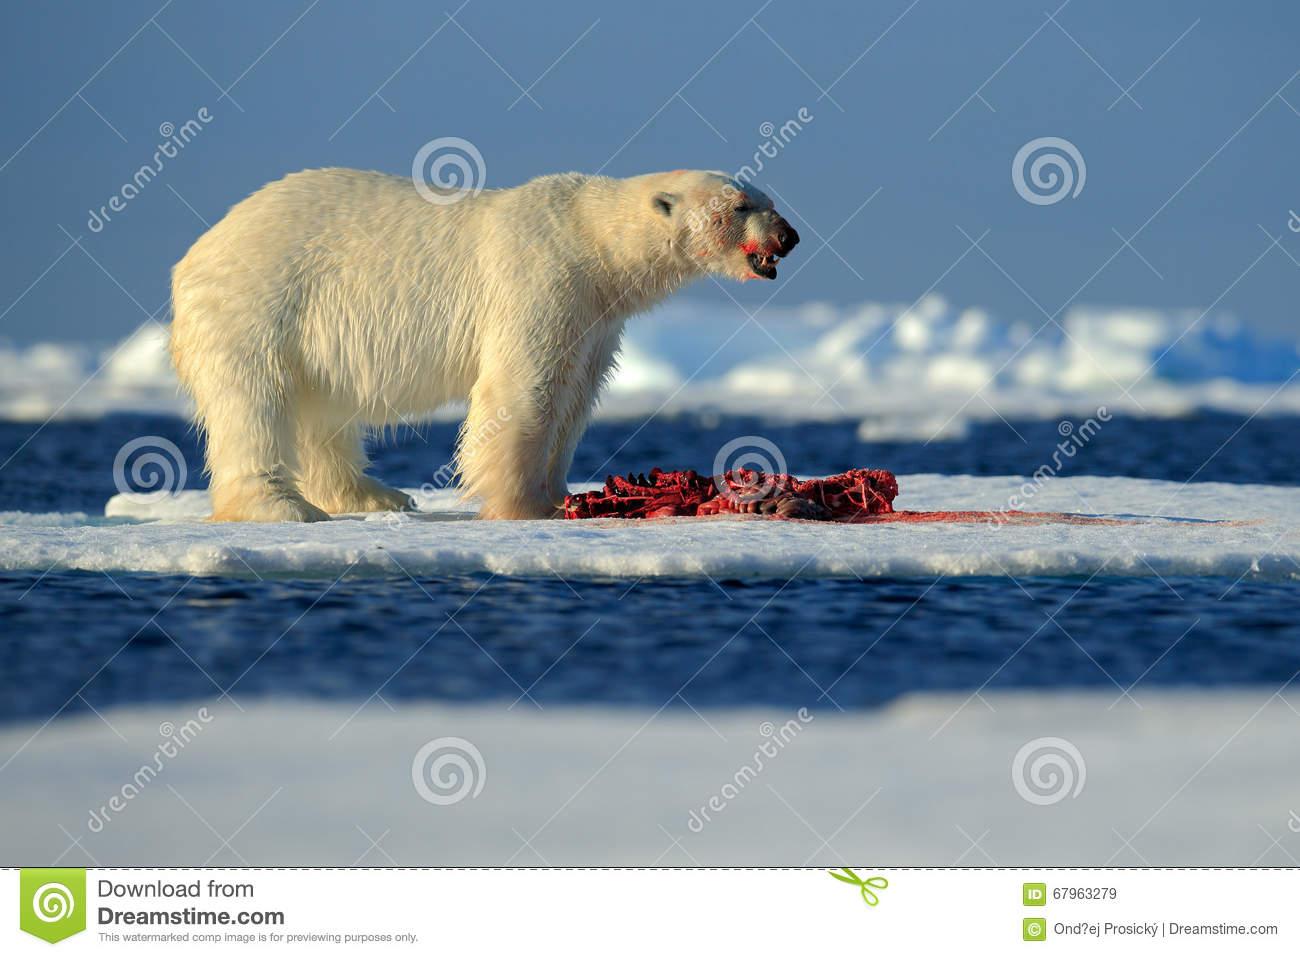 Big Polar Bear On Drift Ice With Snow Feeding Kill Seal, Skeleton.